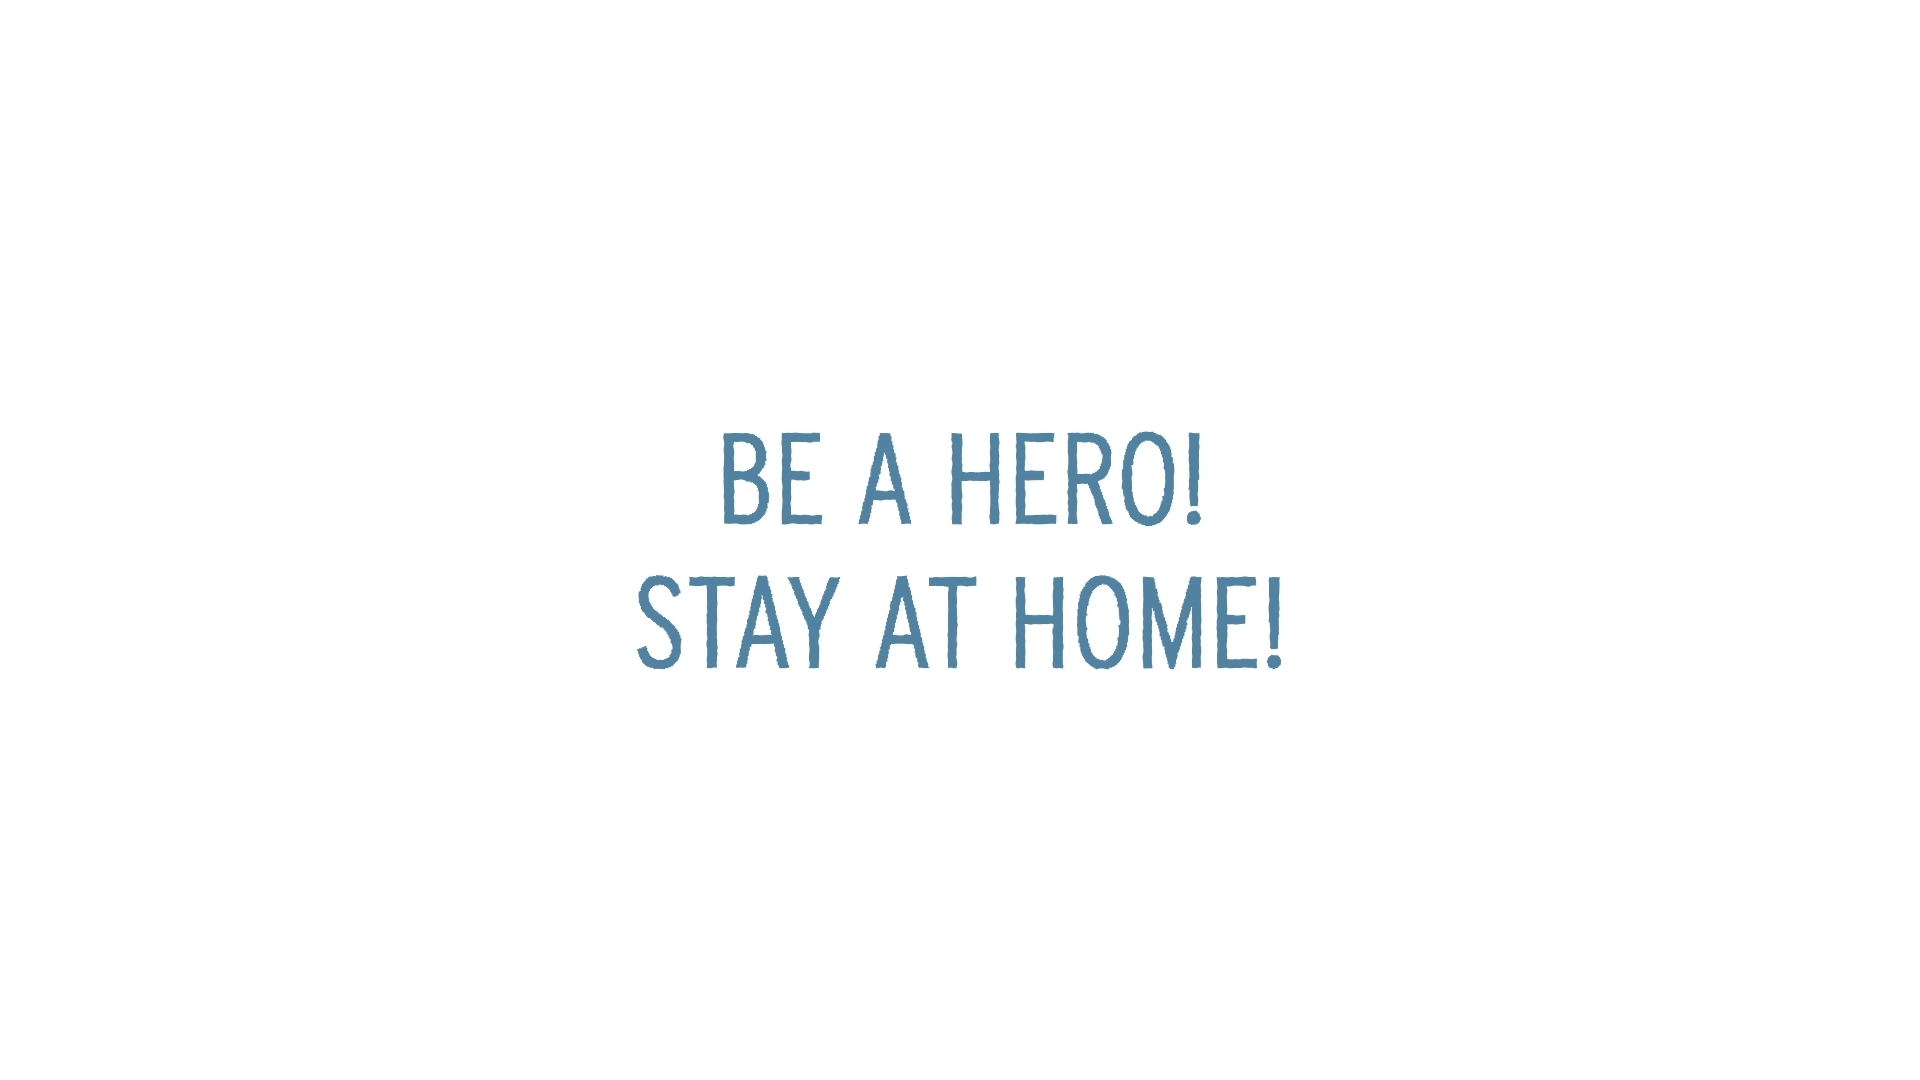 Be a hero Stay at home thumbnail